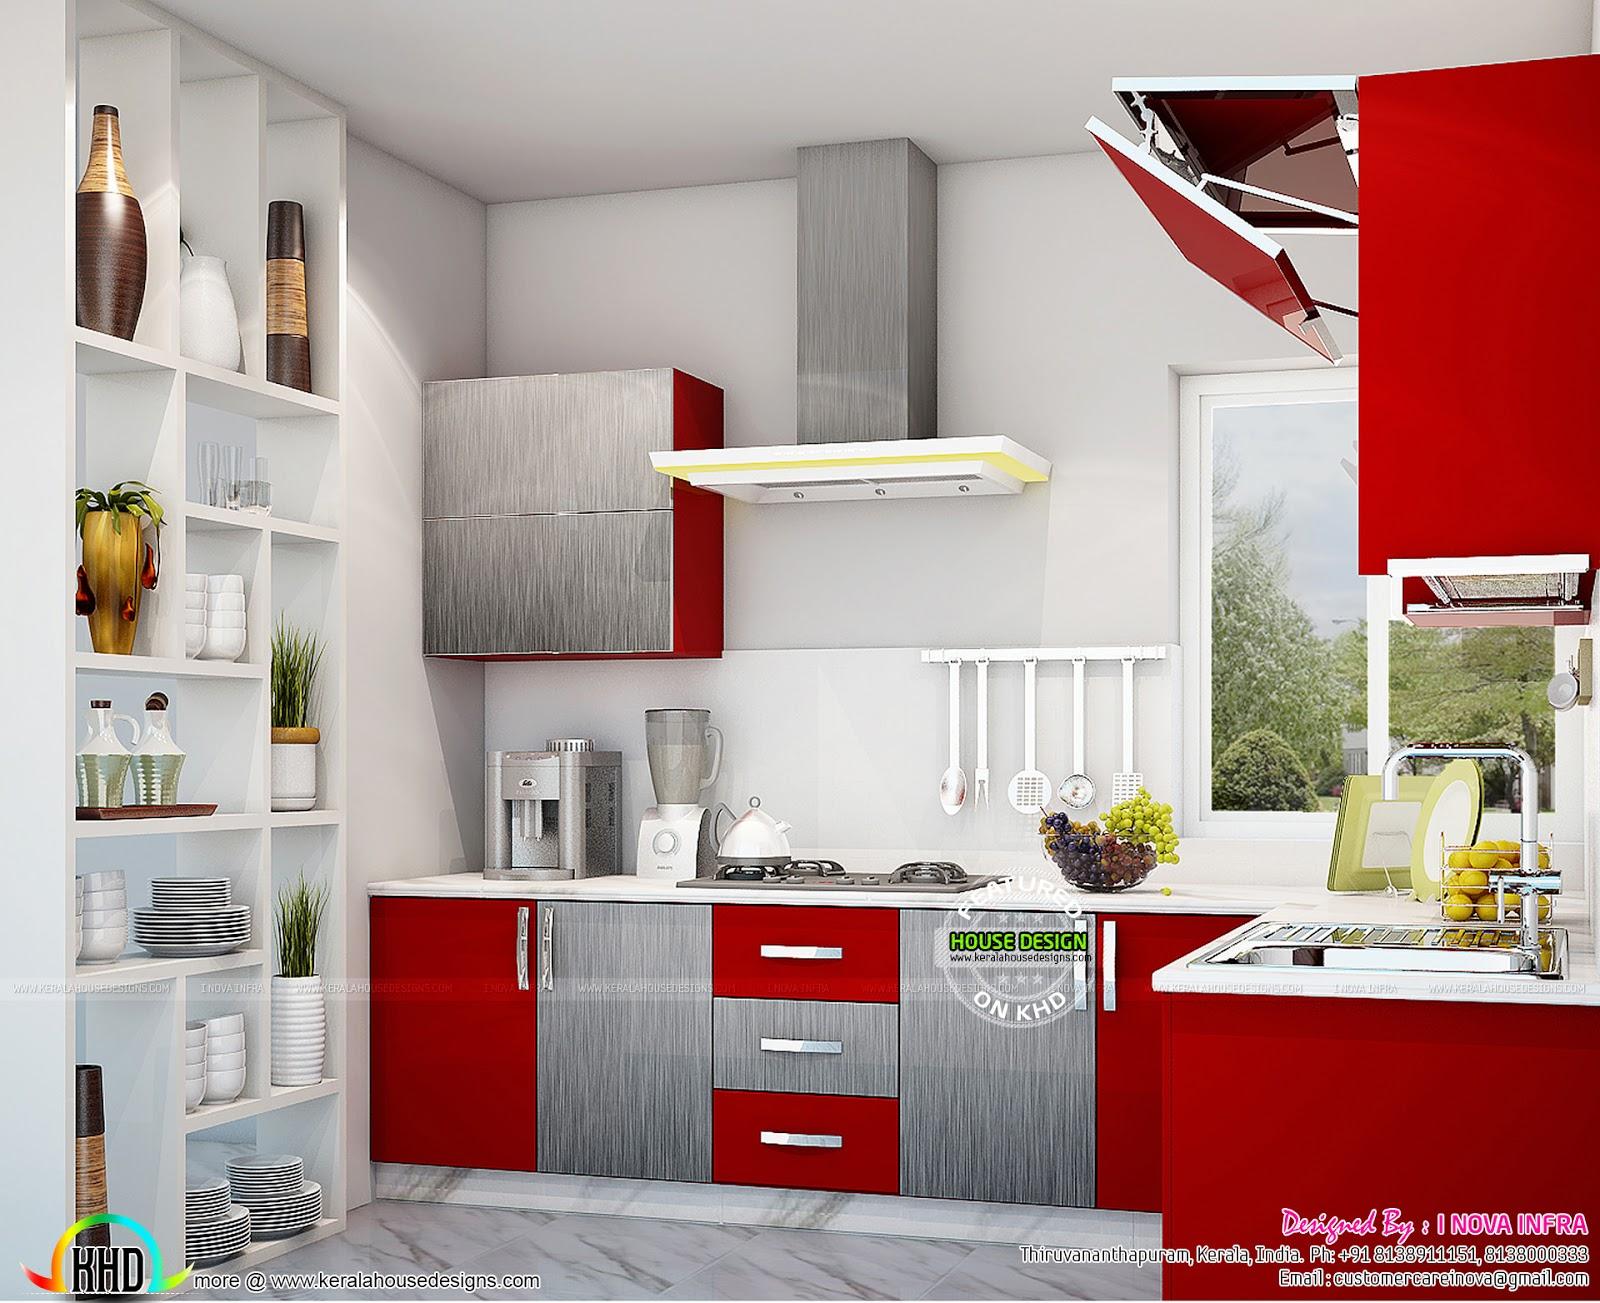 interior design kitchen large island for sale works at trivandrum kerala home